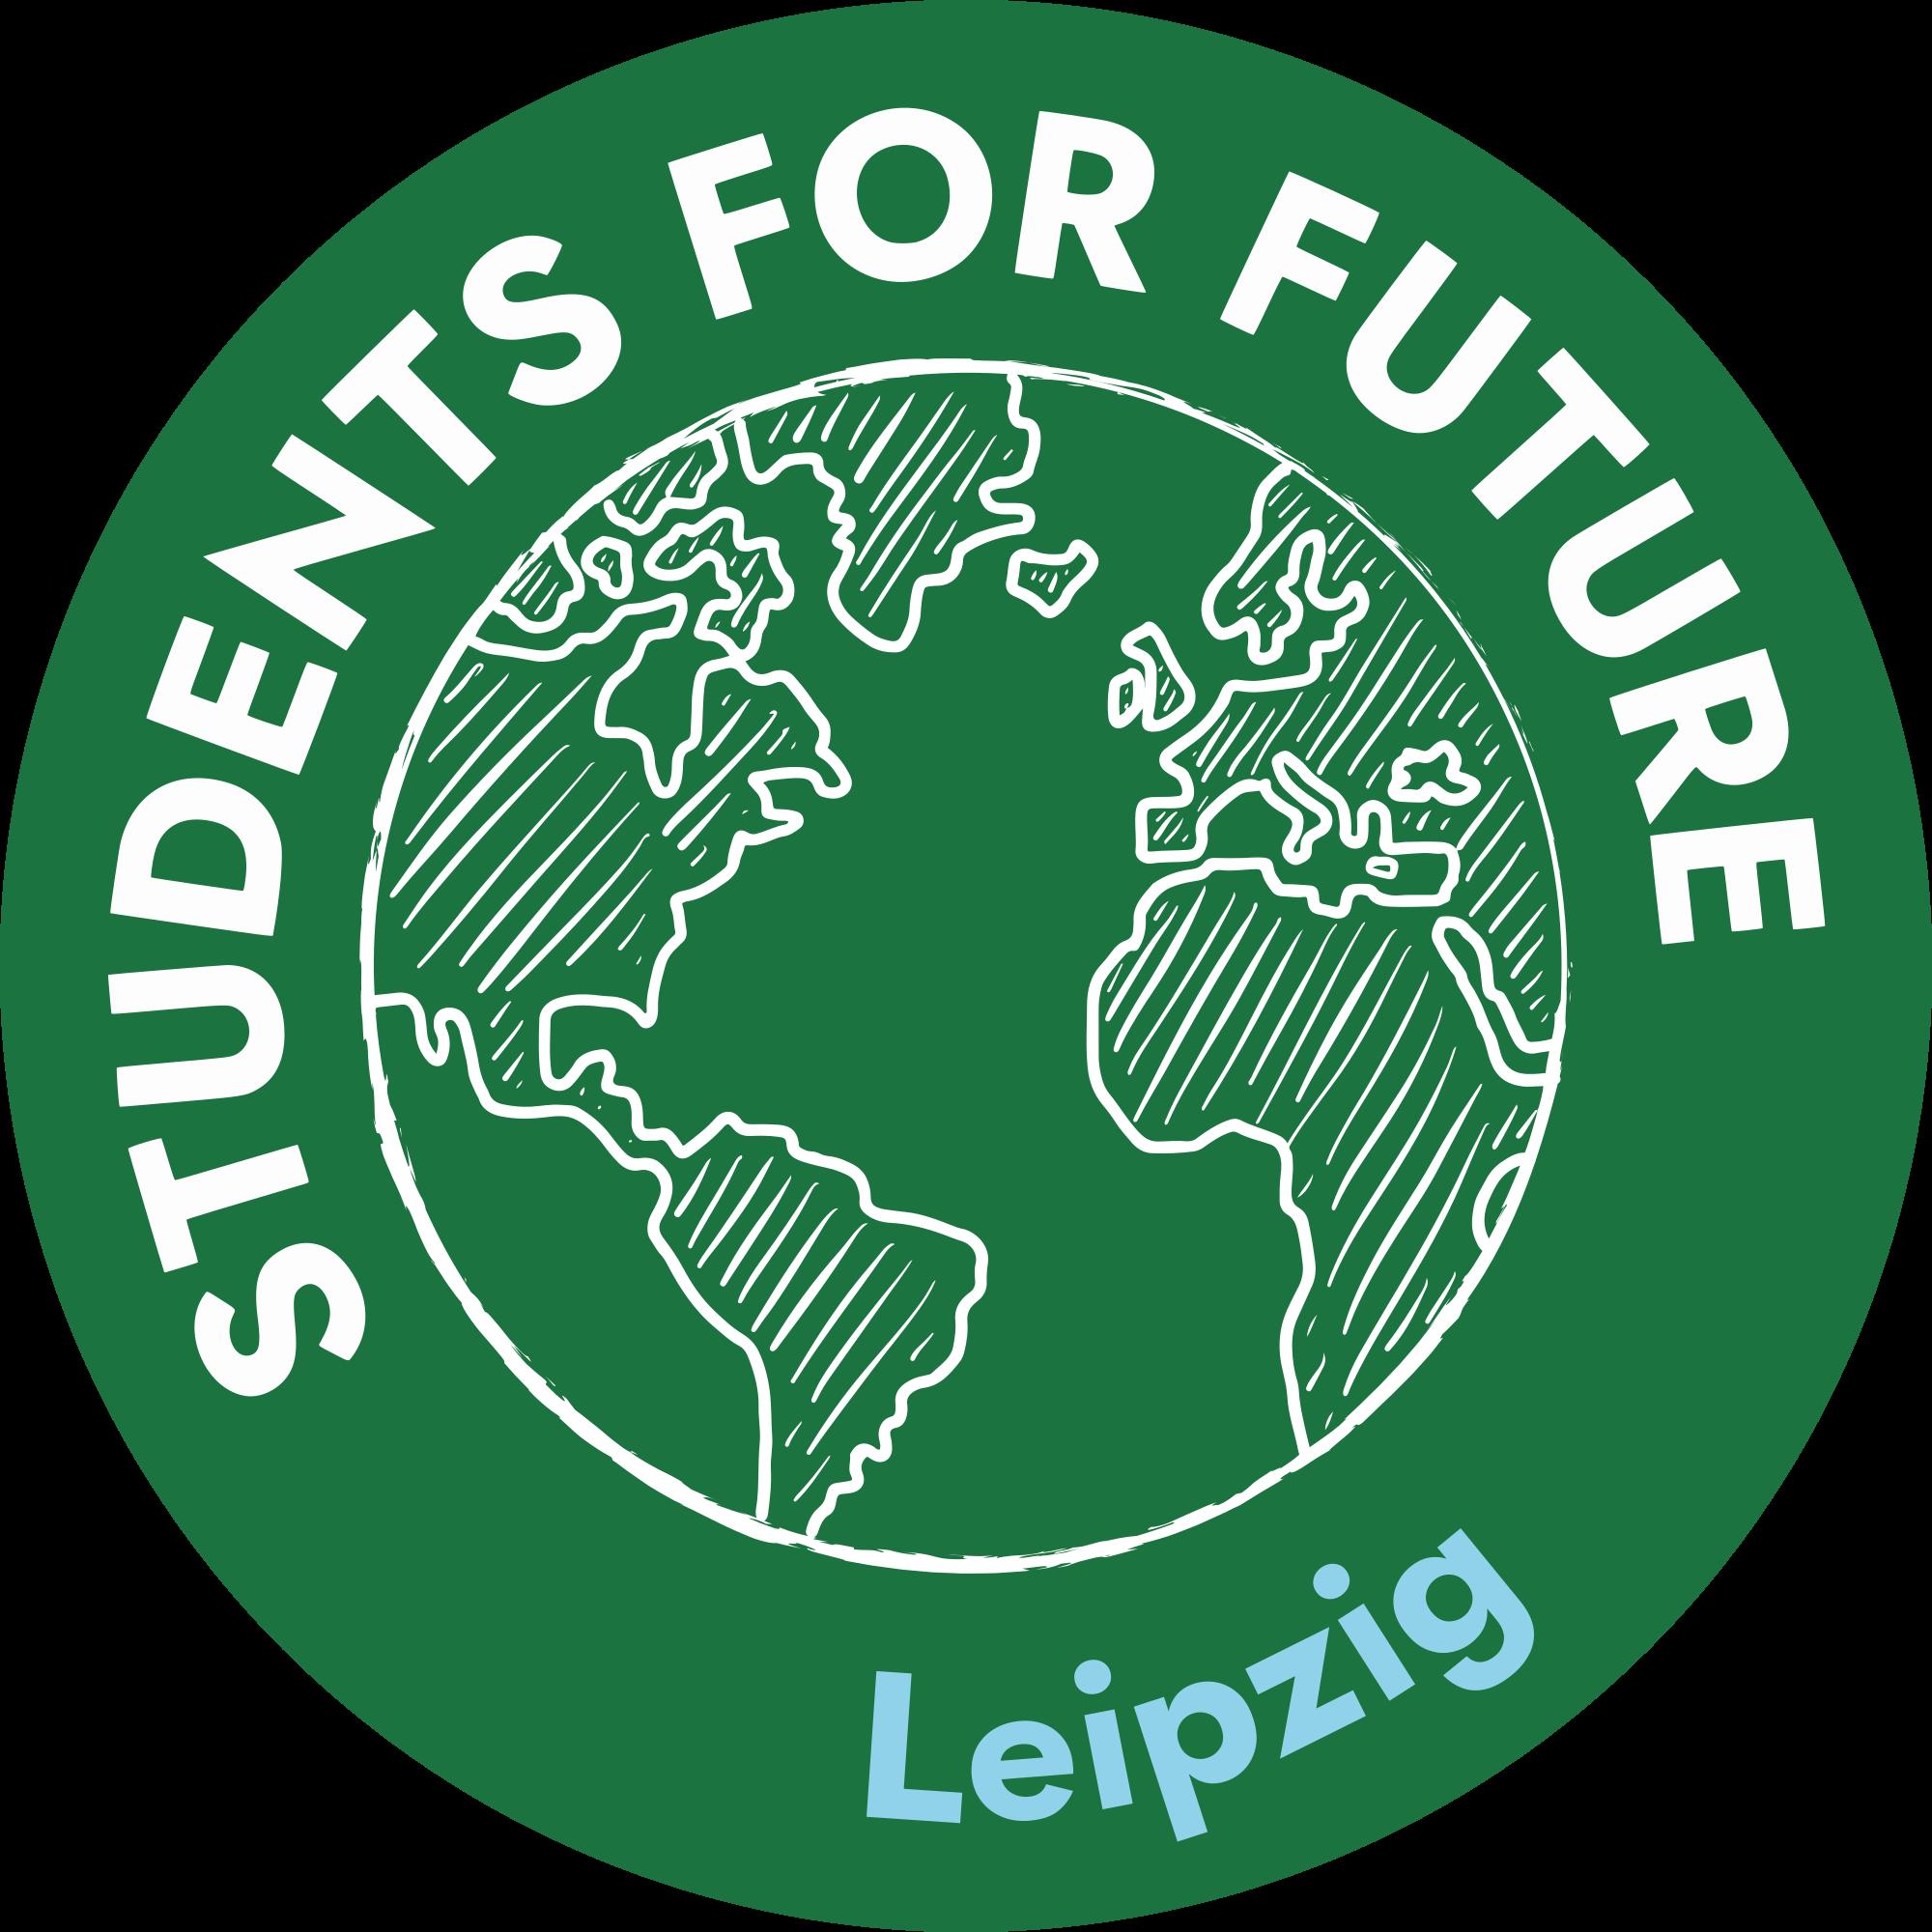 https://studentsforfuture.info/ortsgruppe/leipzig/